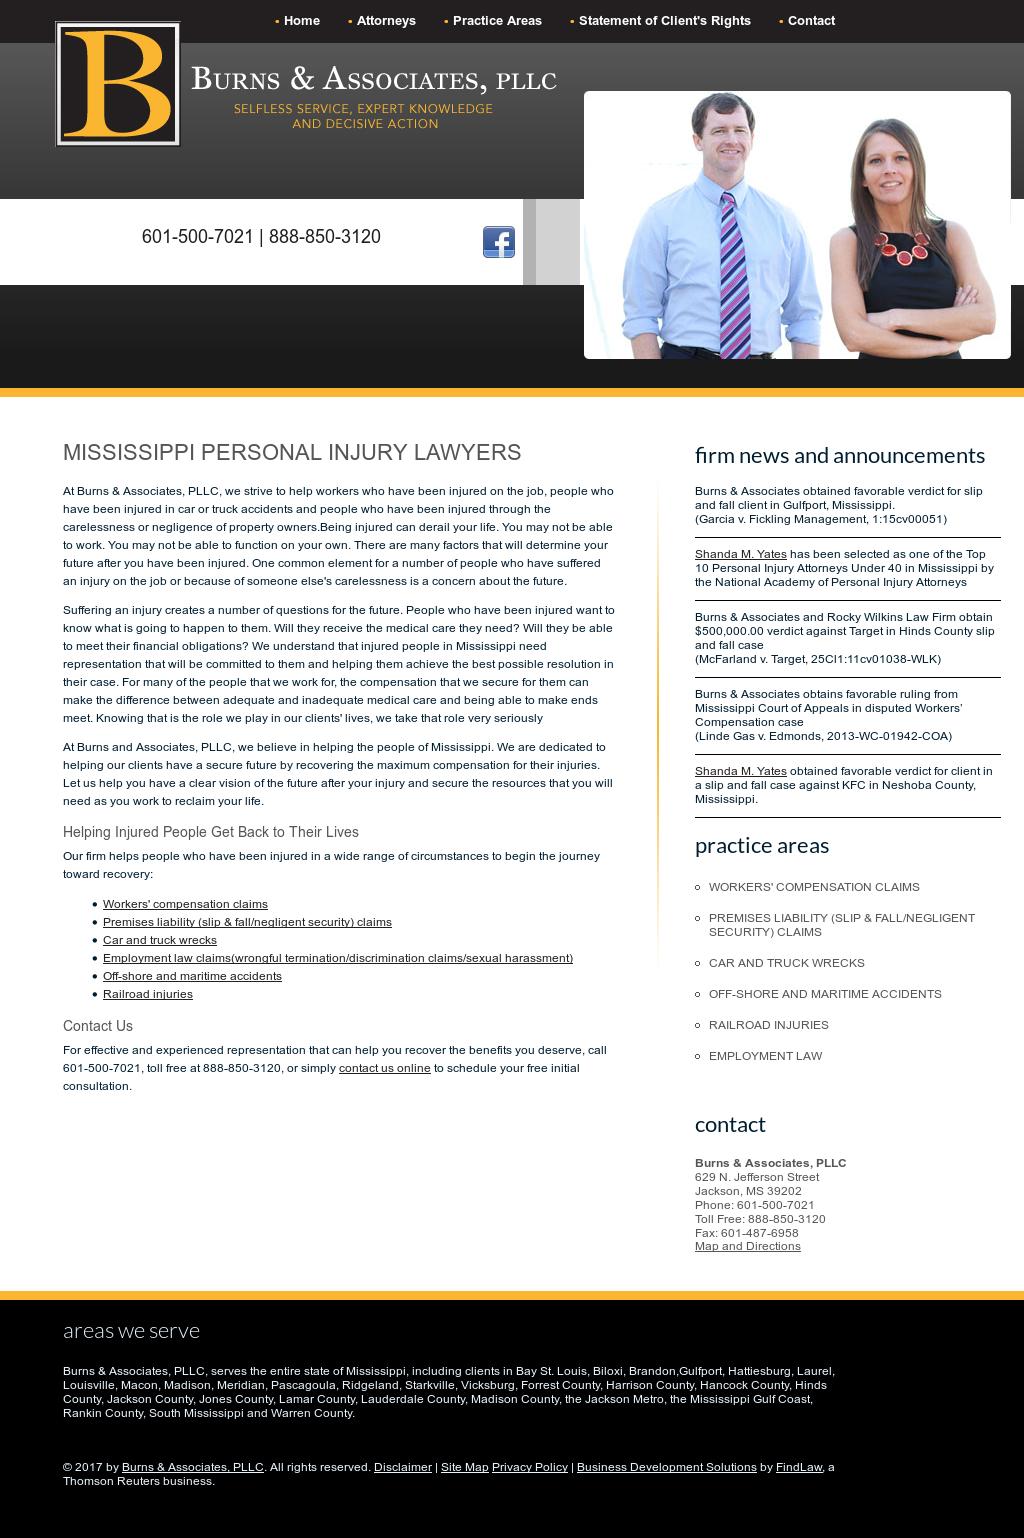 Burns & Associates, Pllc Competitors, Revenue and Employees